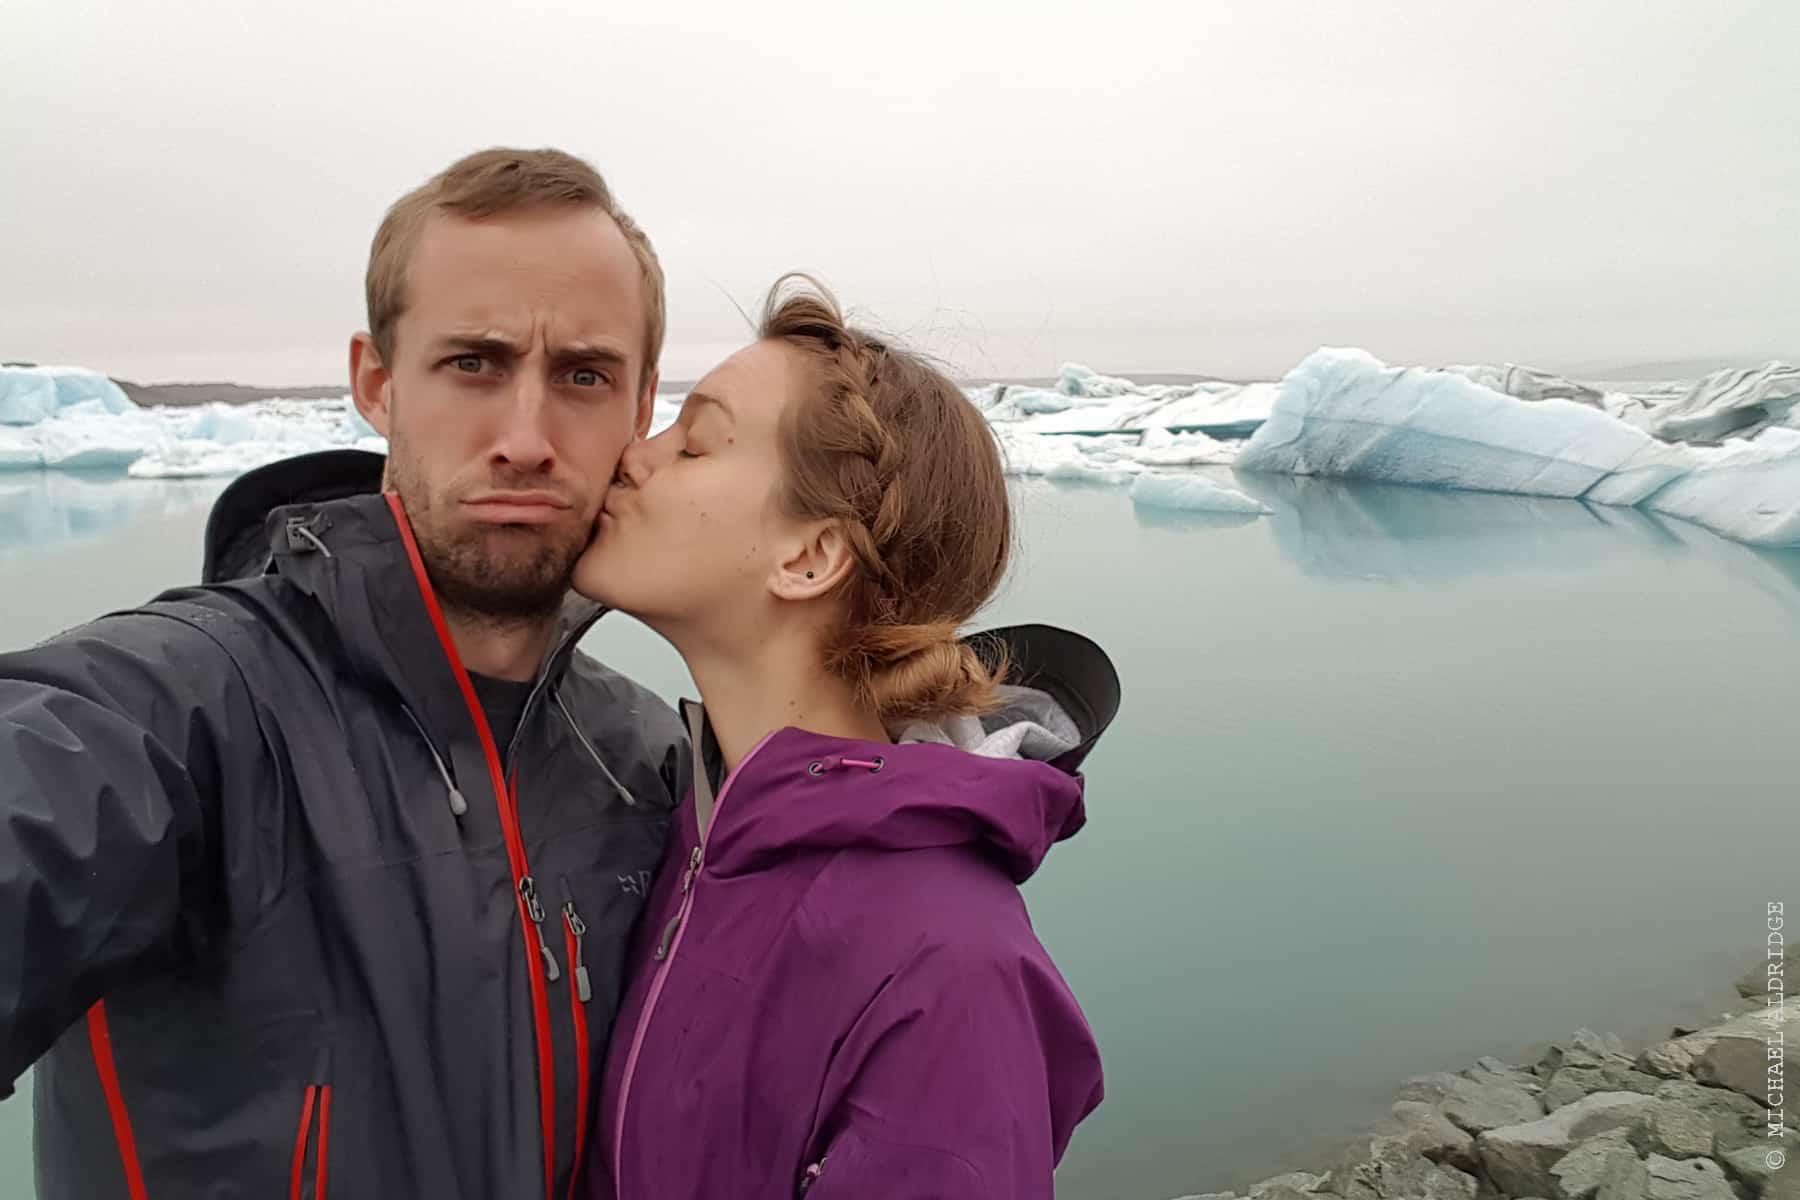 Me and Dora in Jökulsárlón Iceberg Lagoon, Iceland